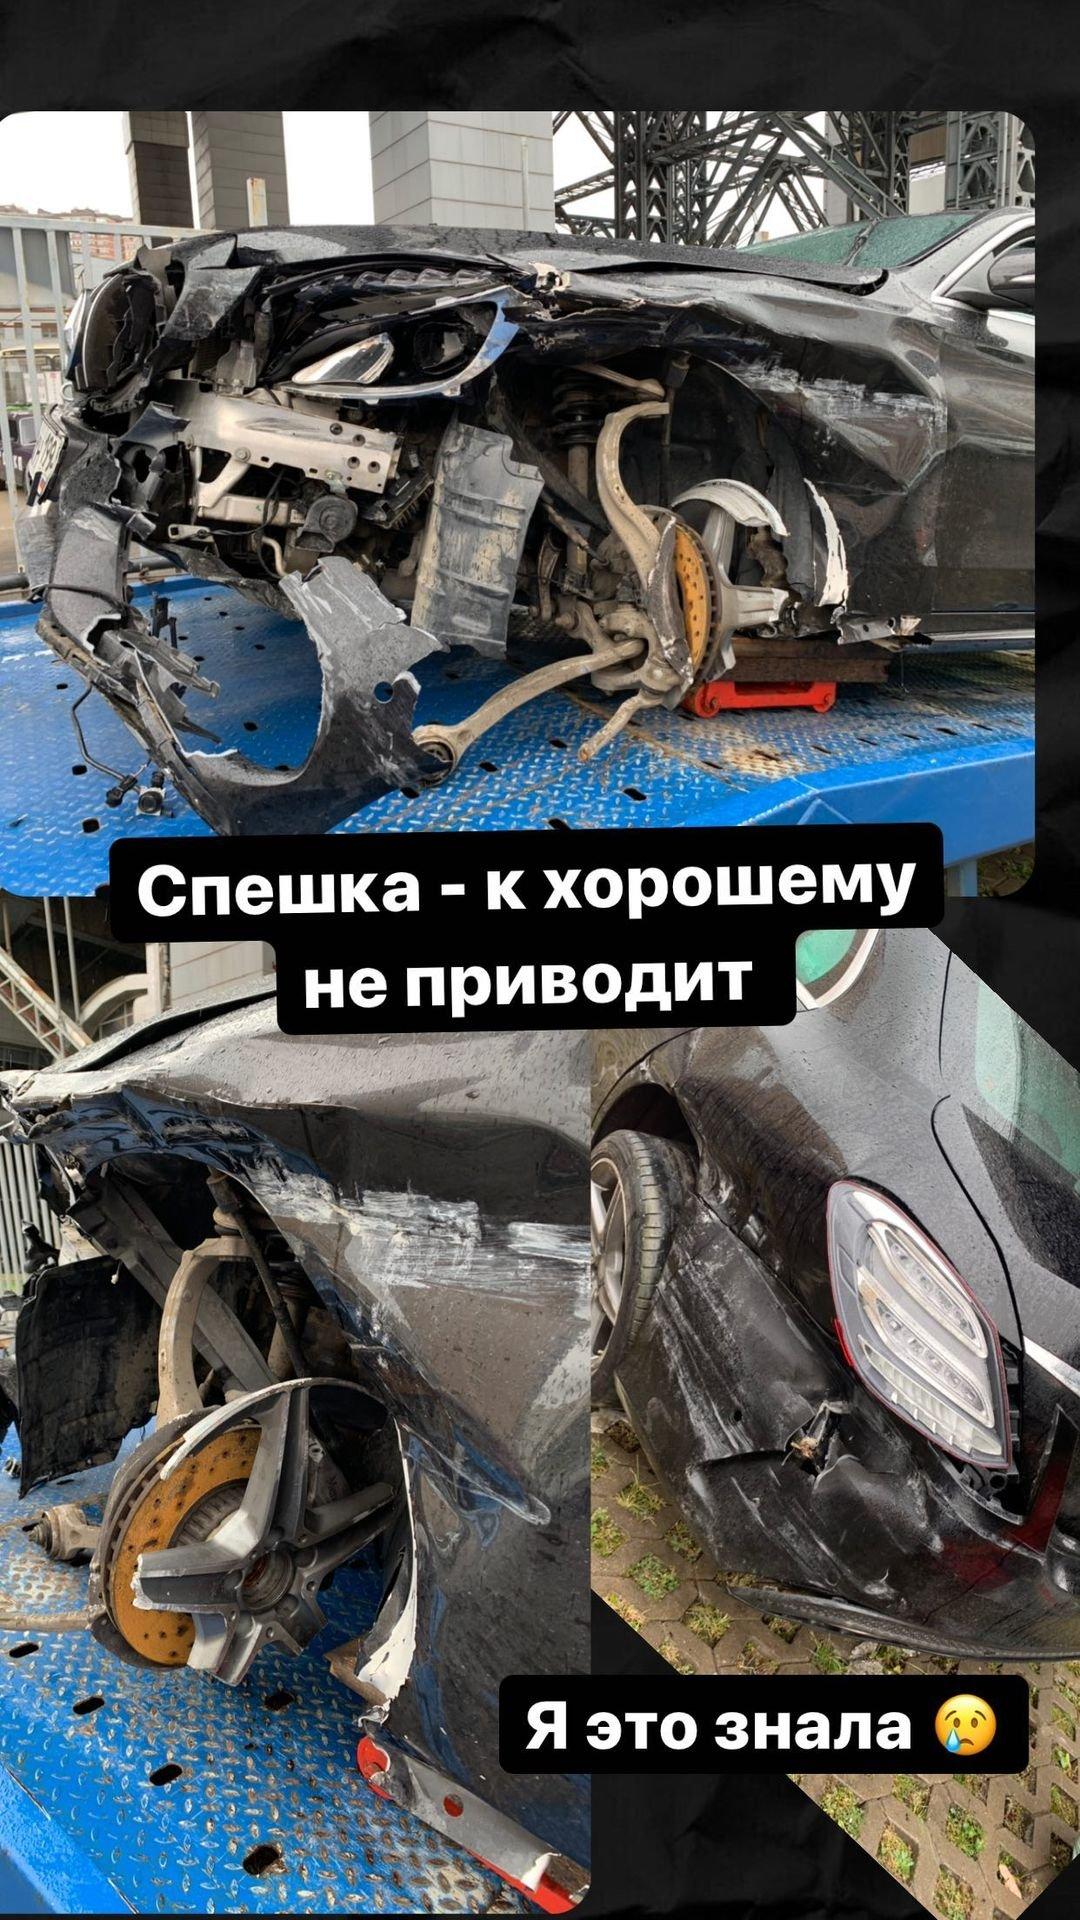 """Я знала"": Марина Африкантова возложила вину за ДТП на Романа Капаклы"